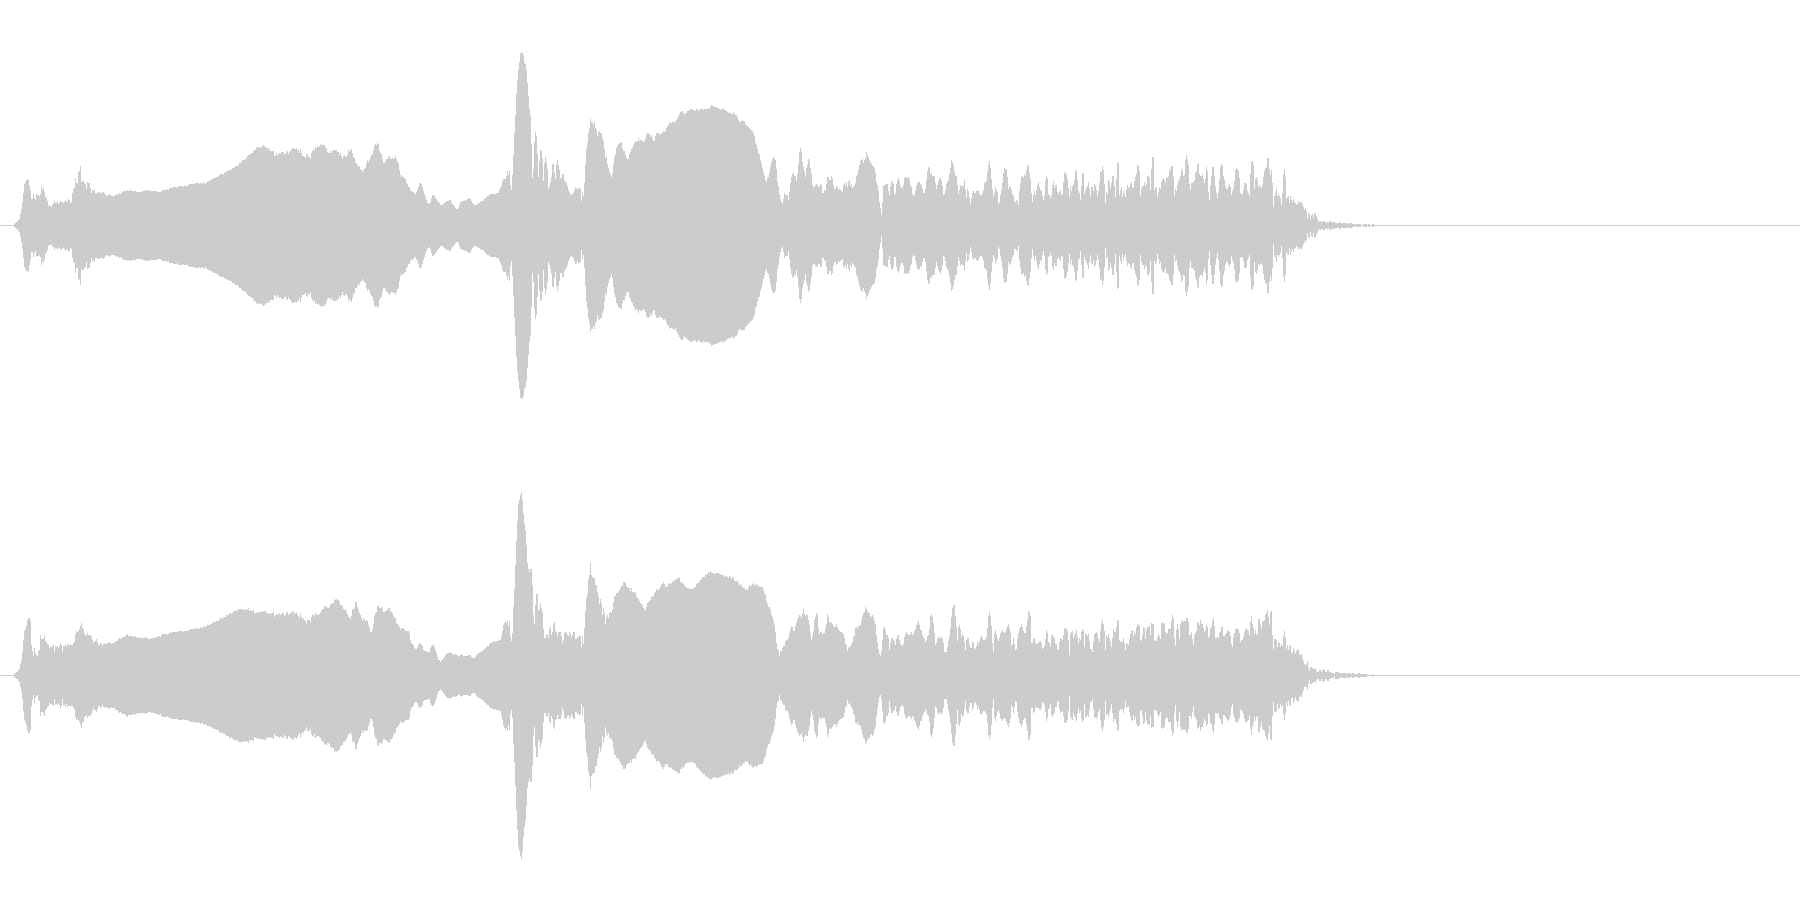 尺八 生演奏 古典風#7の未再生の波形